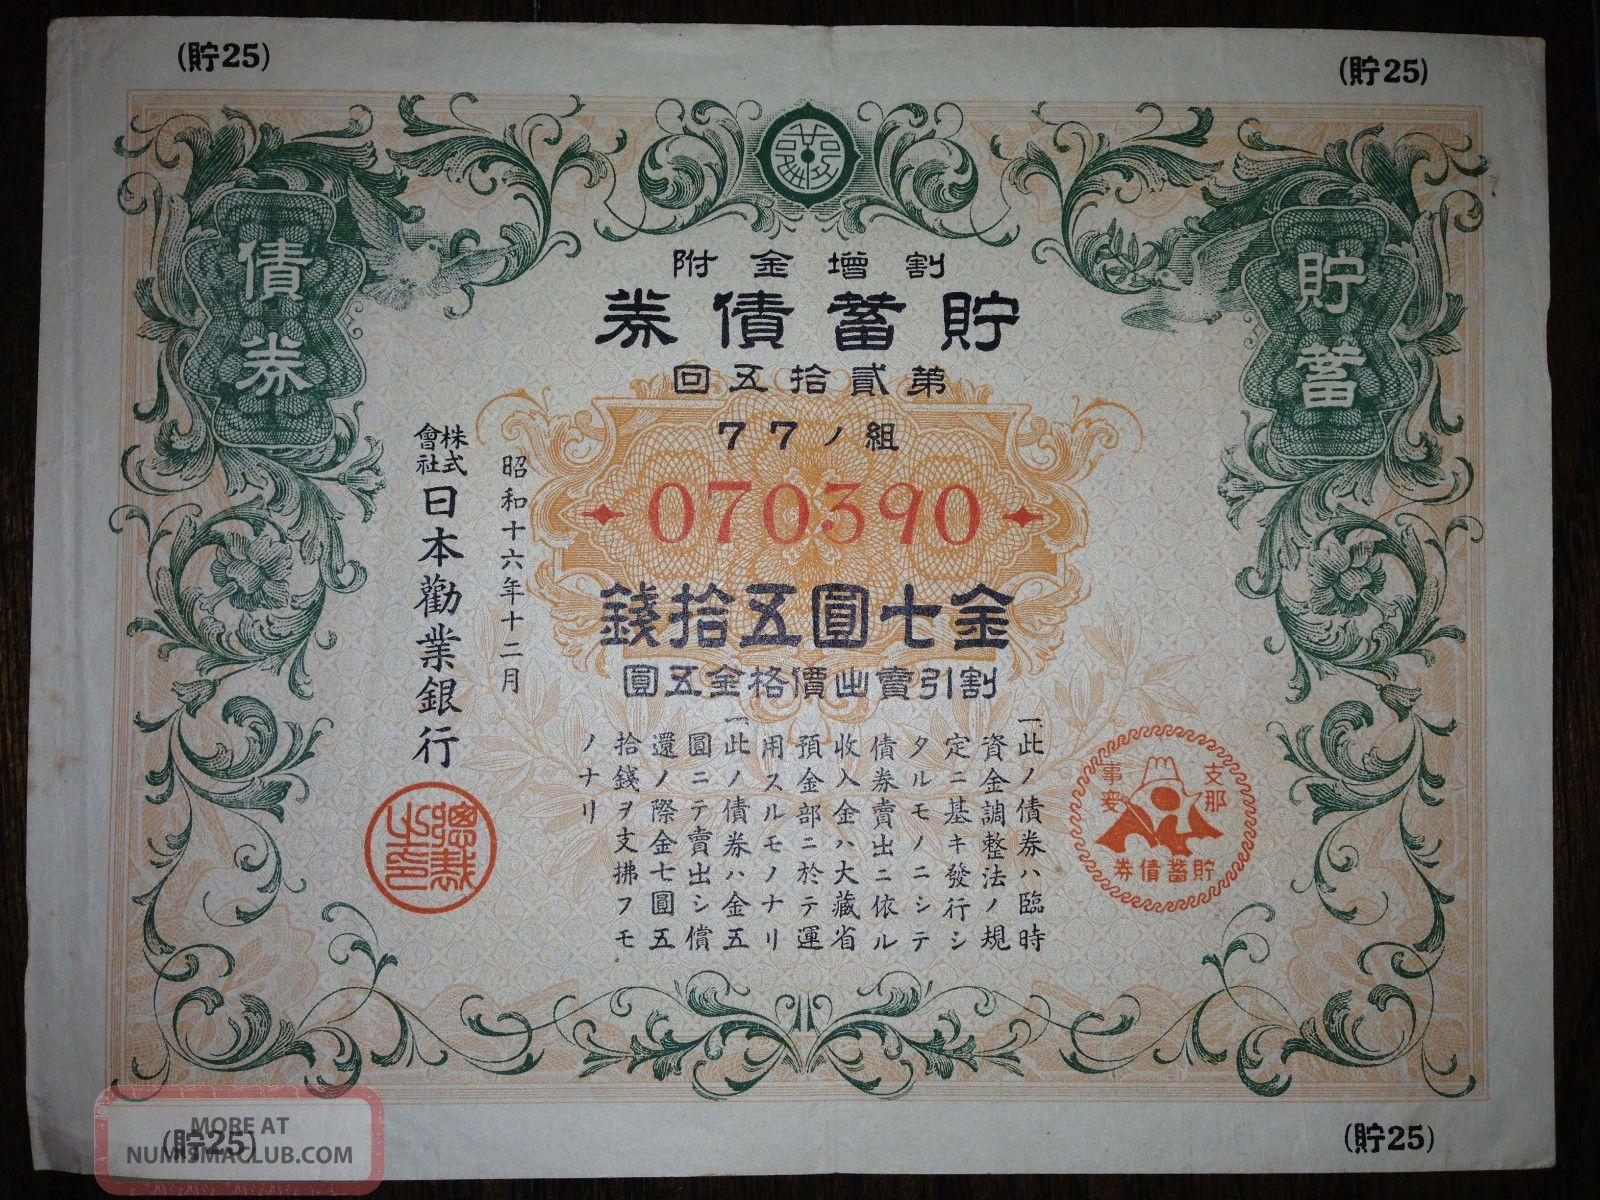 Japan World War2.  Government War Bond.  Sino - Japanese War.  1941.  Japan - China War.  Ww2 Stocks & Bonds, Scripophily photo